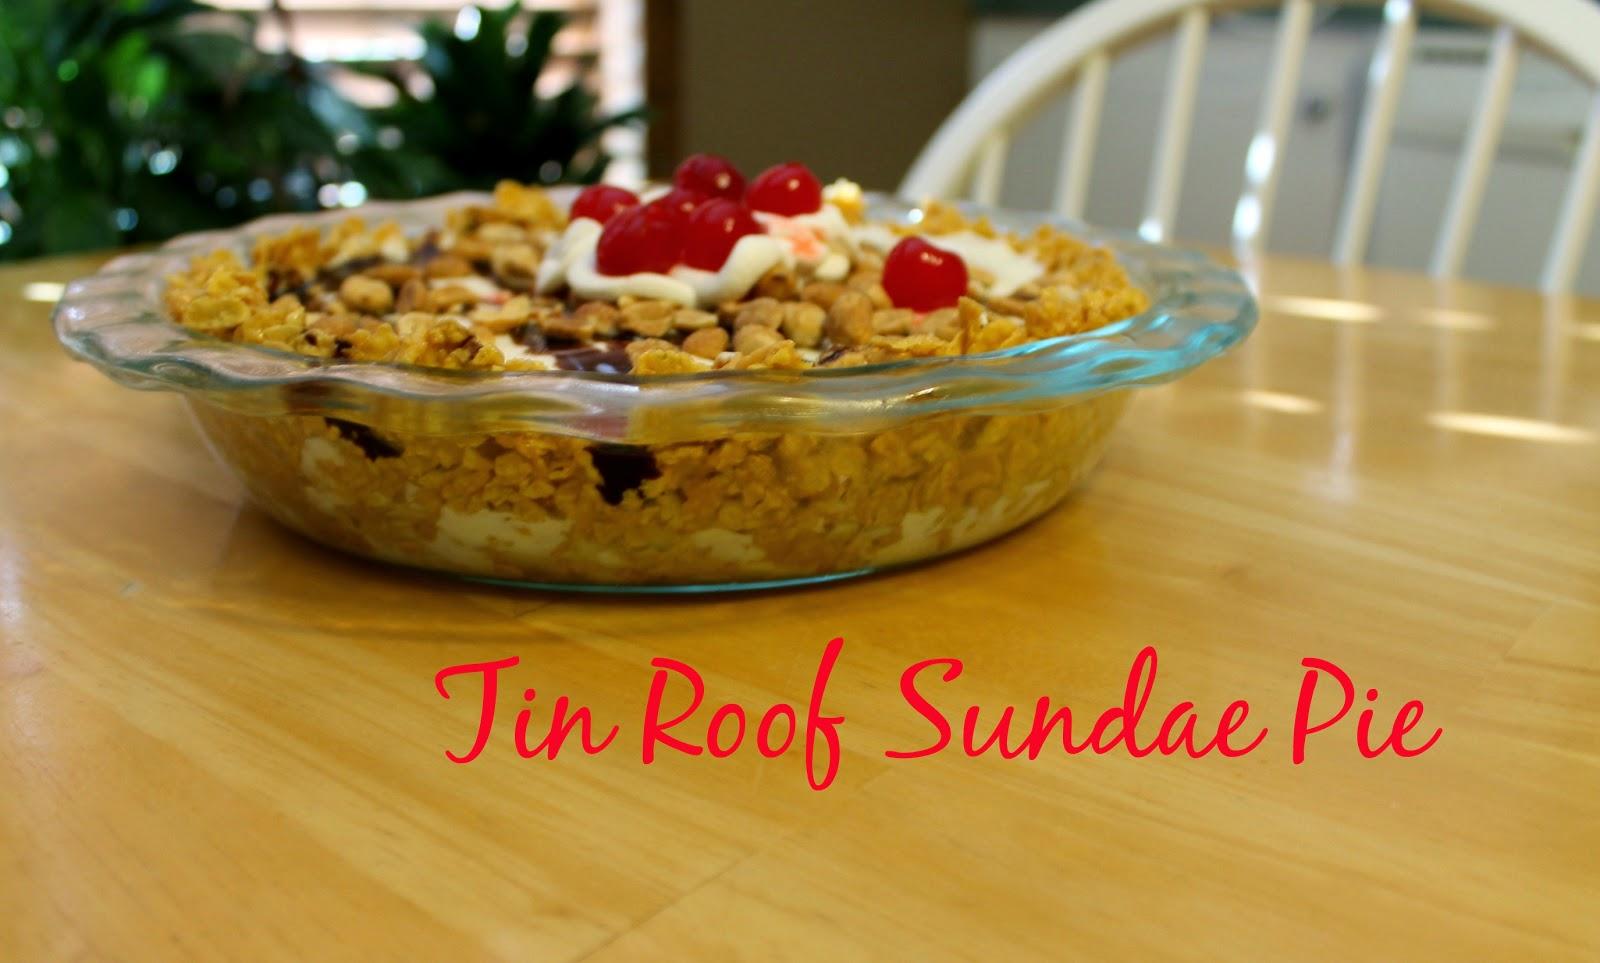 Tin Roof Sundae Pie - Week 35